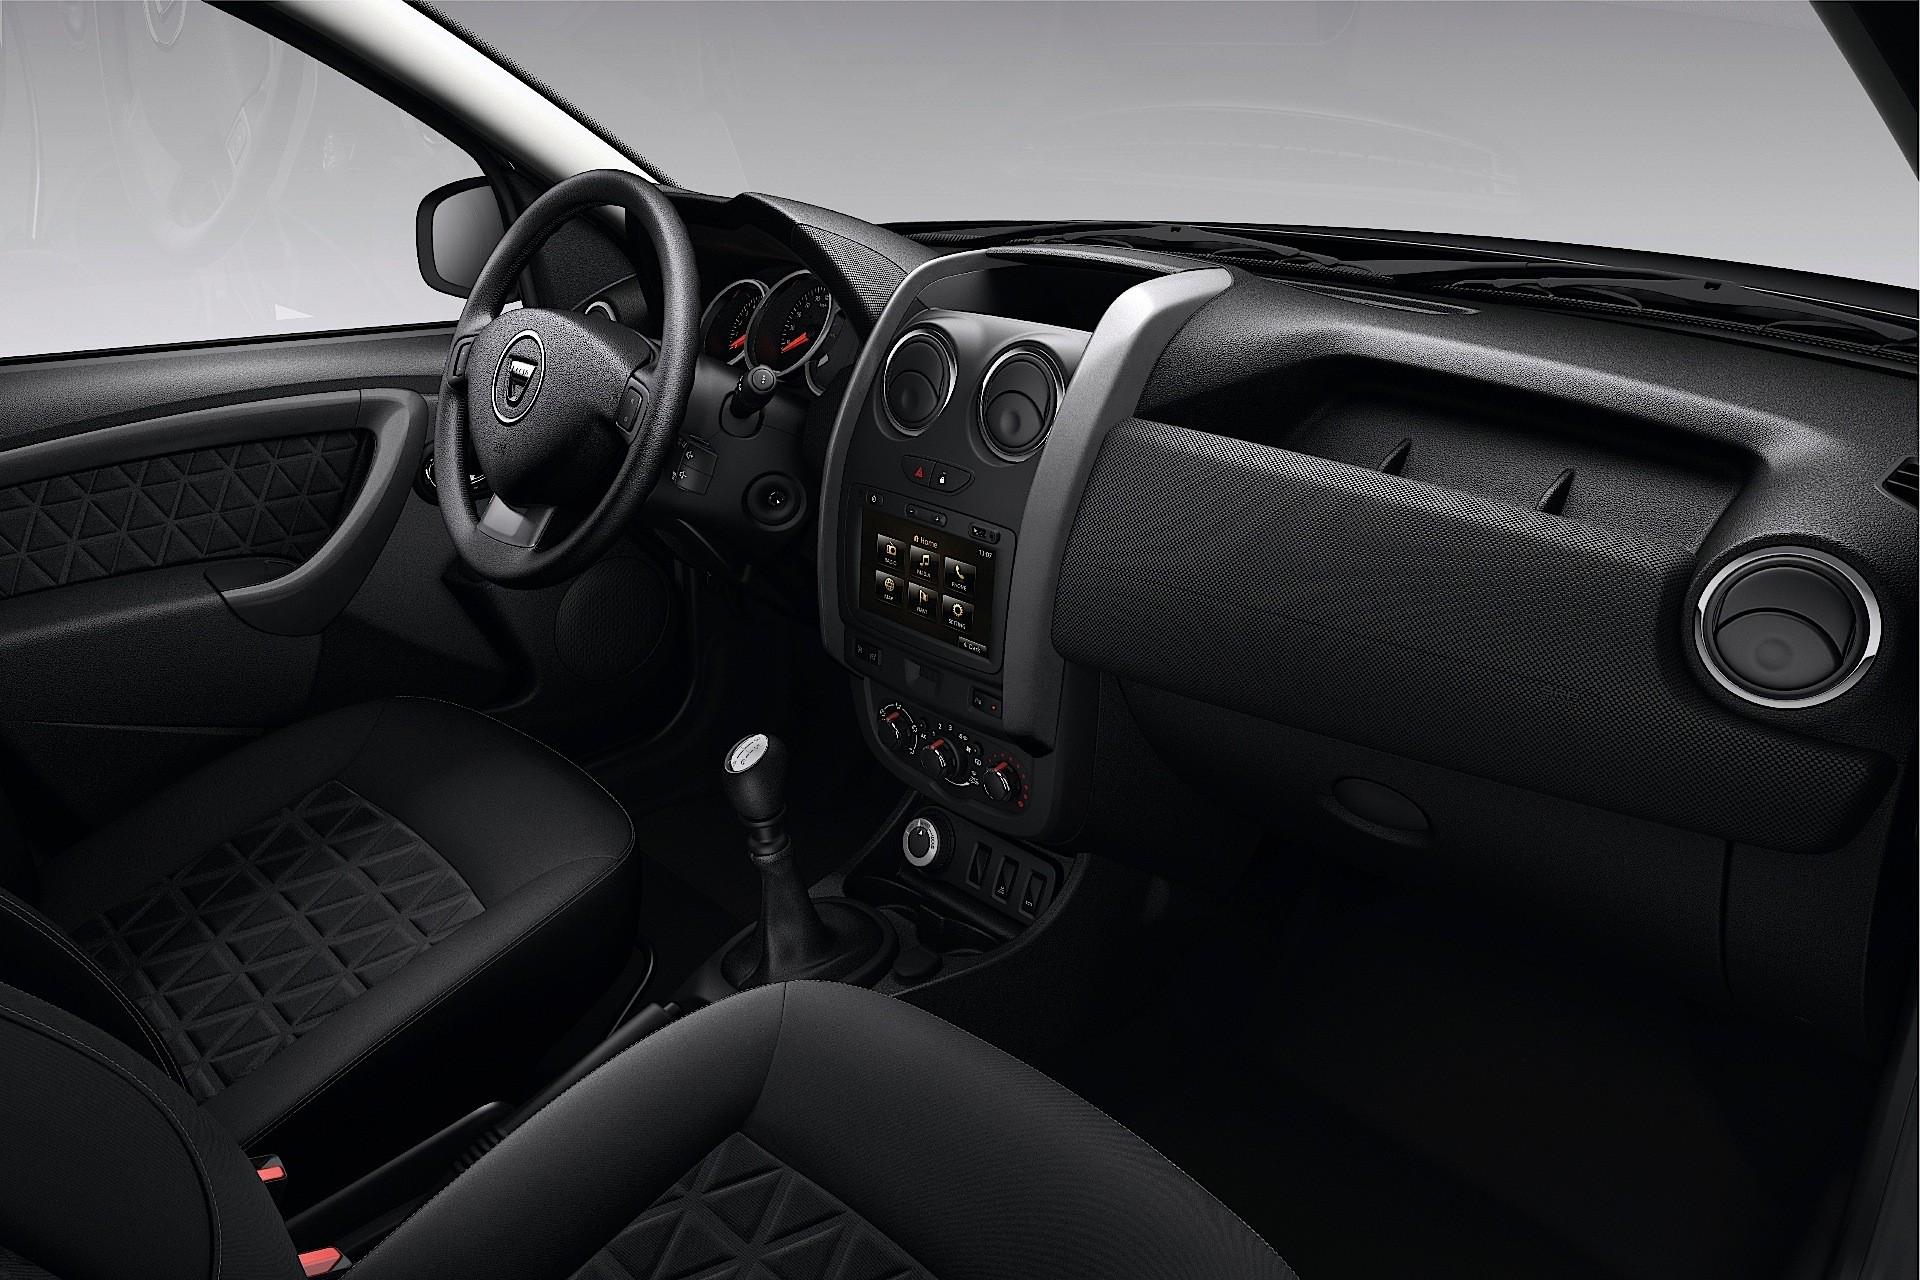 dacia-duster-sport-utility-vehicle-5-doors-2014-model-interior-photos-12.jpg